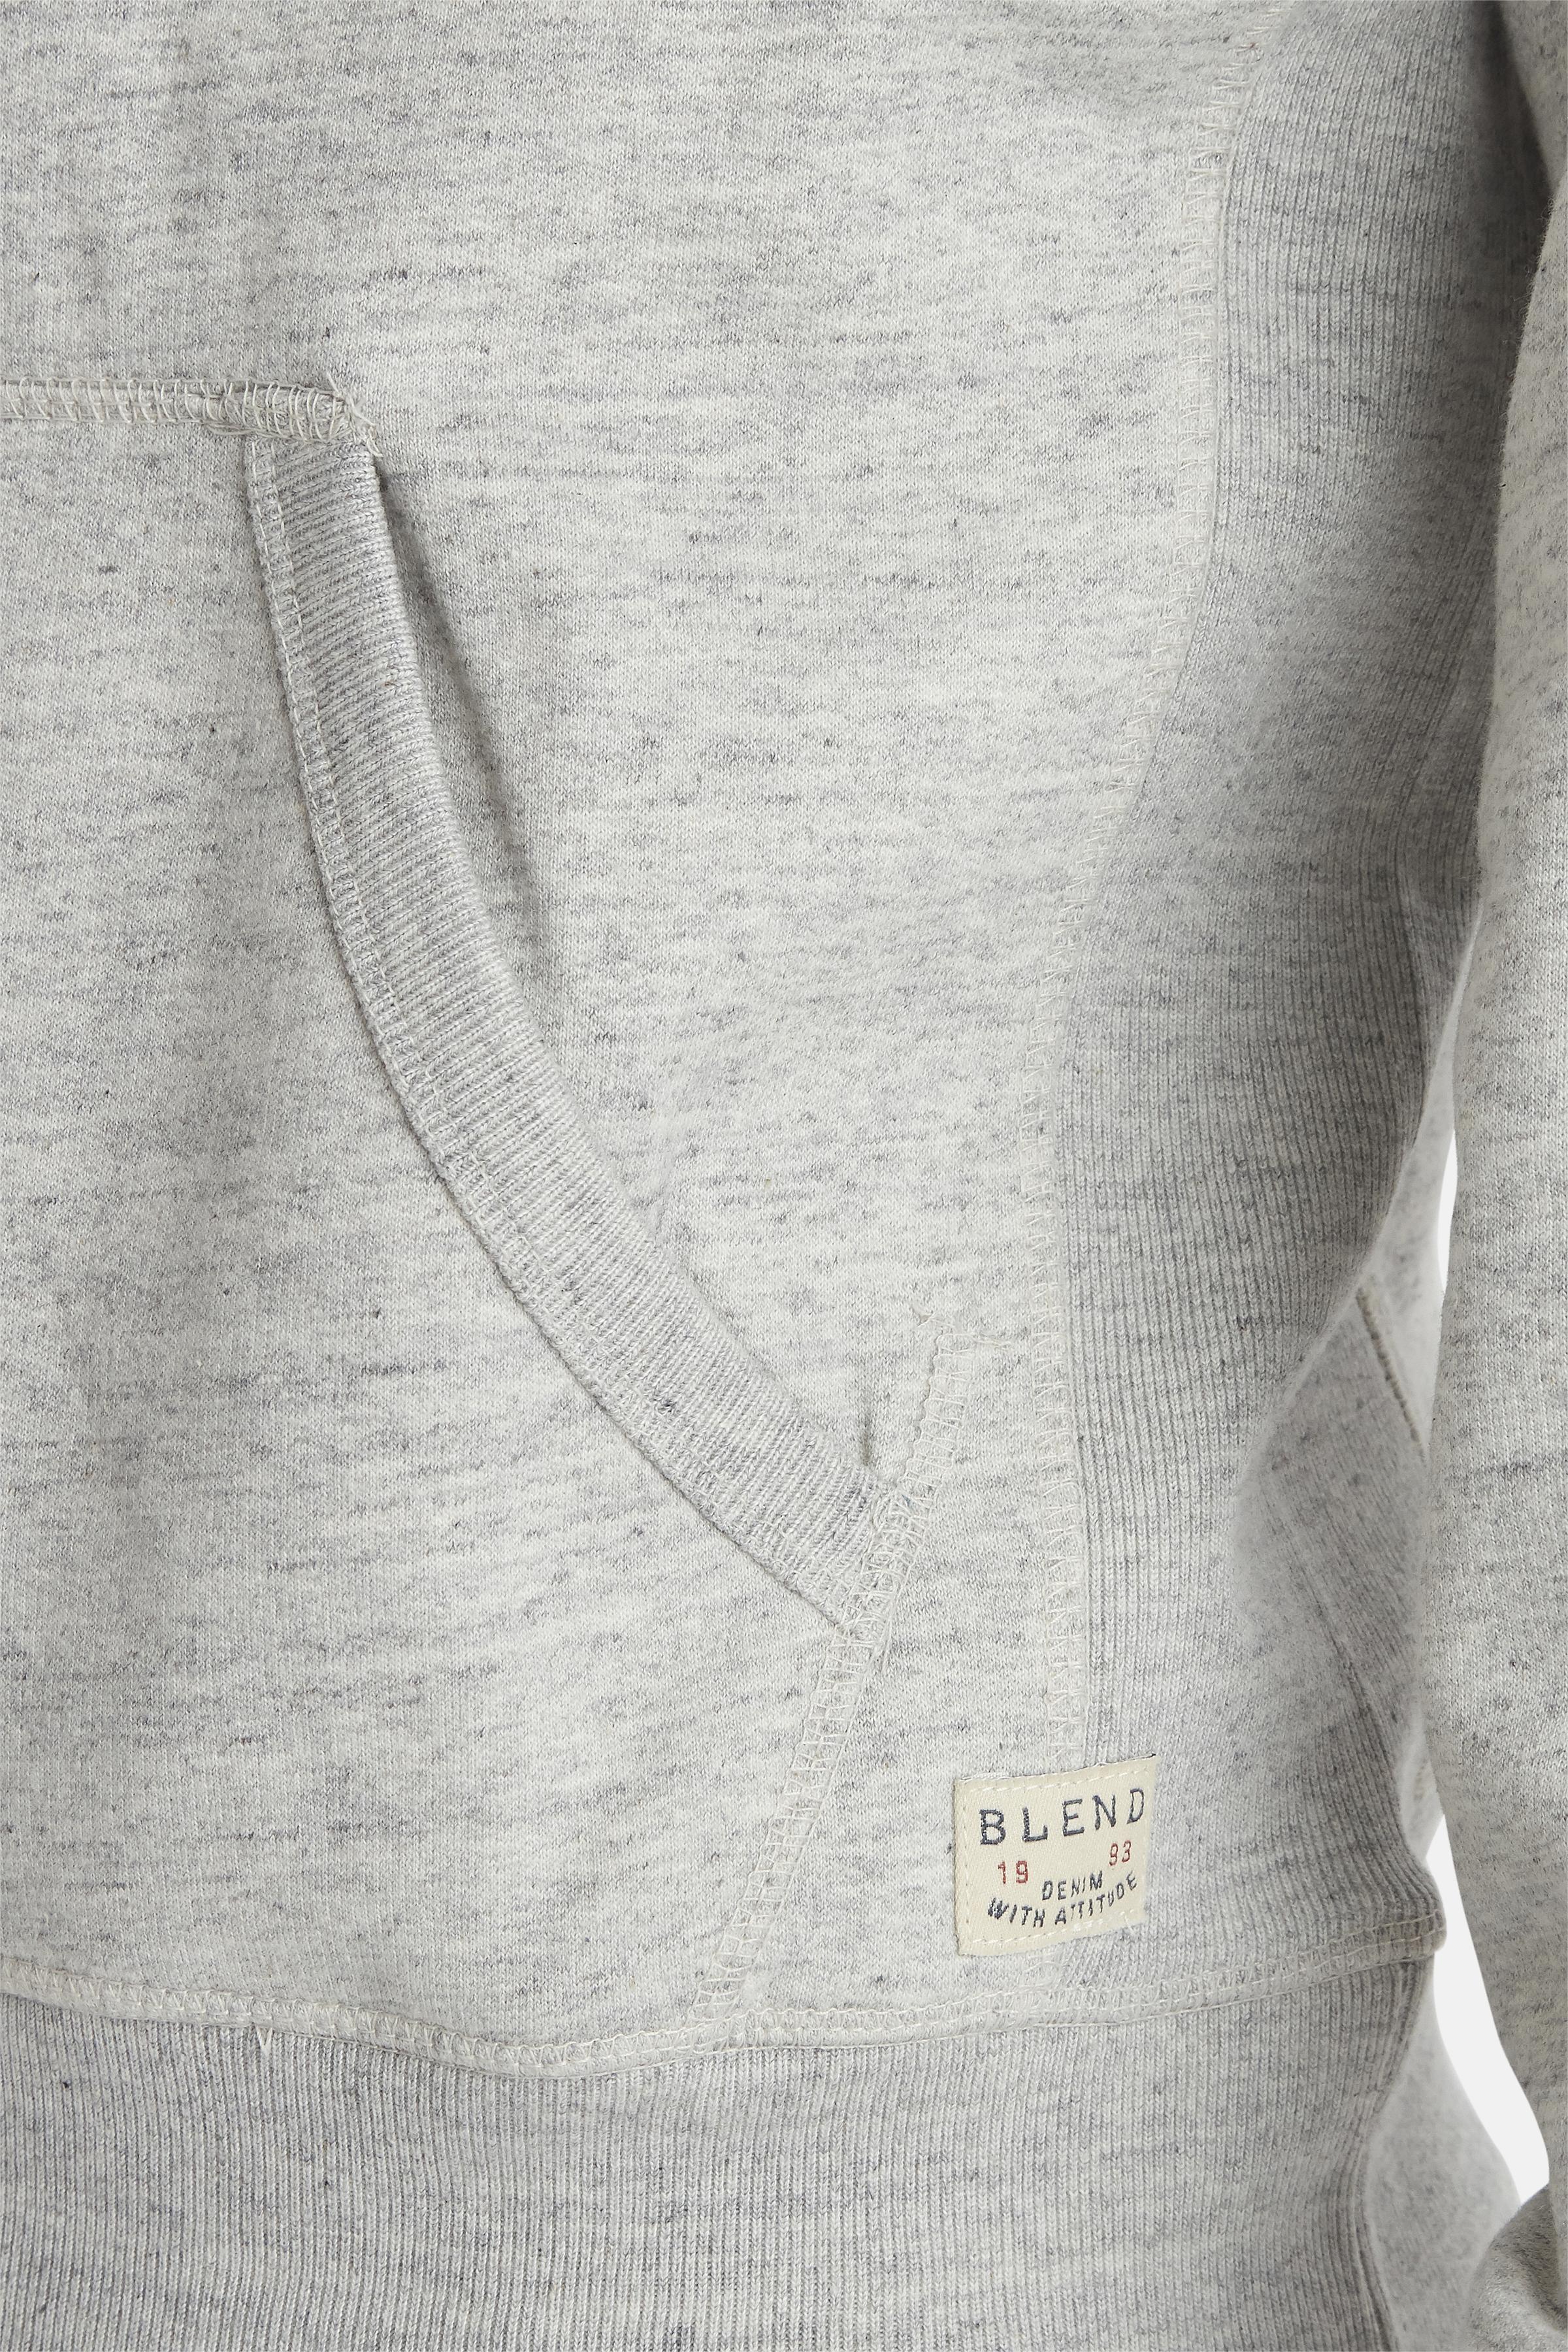 Lysegrå Sweatshirt fra Blend He – Køb Lysegrå Sweatshirt fra str. S-3XL her